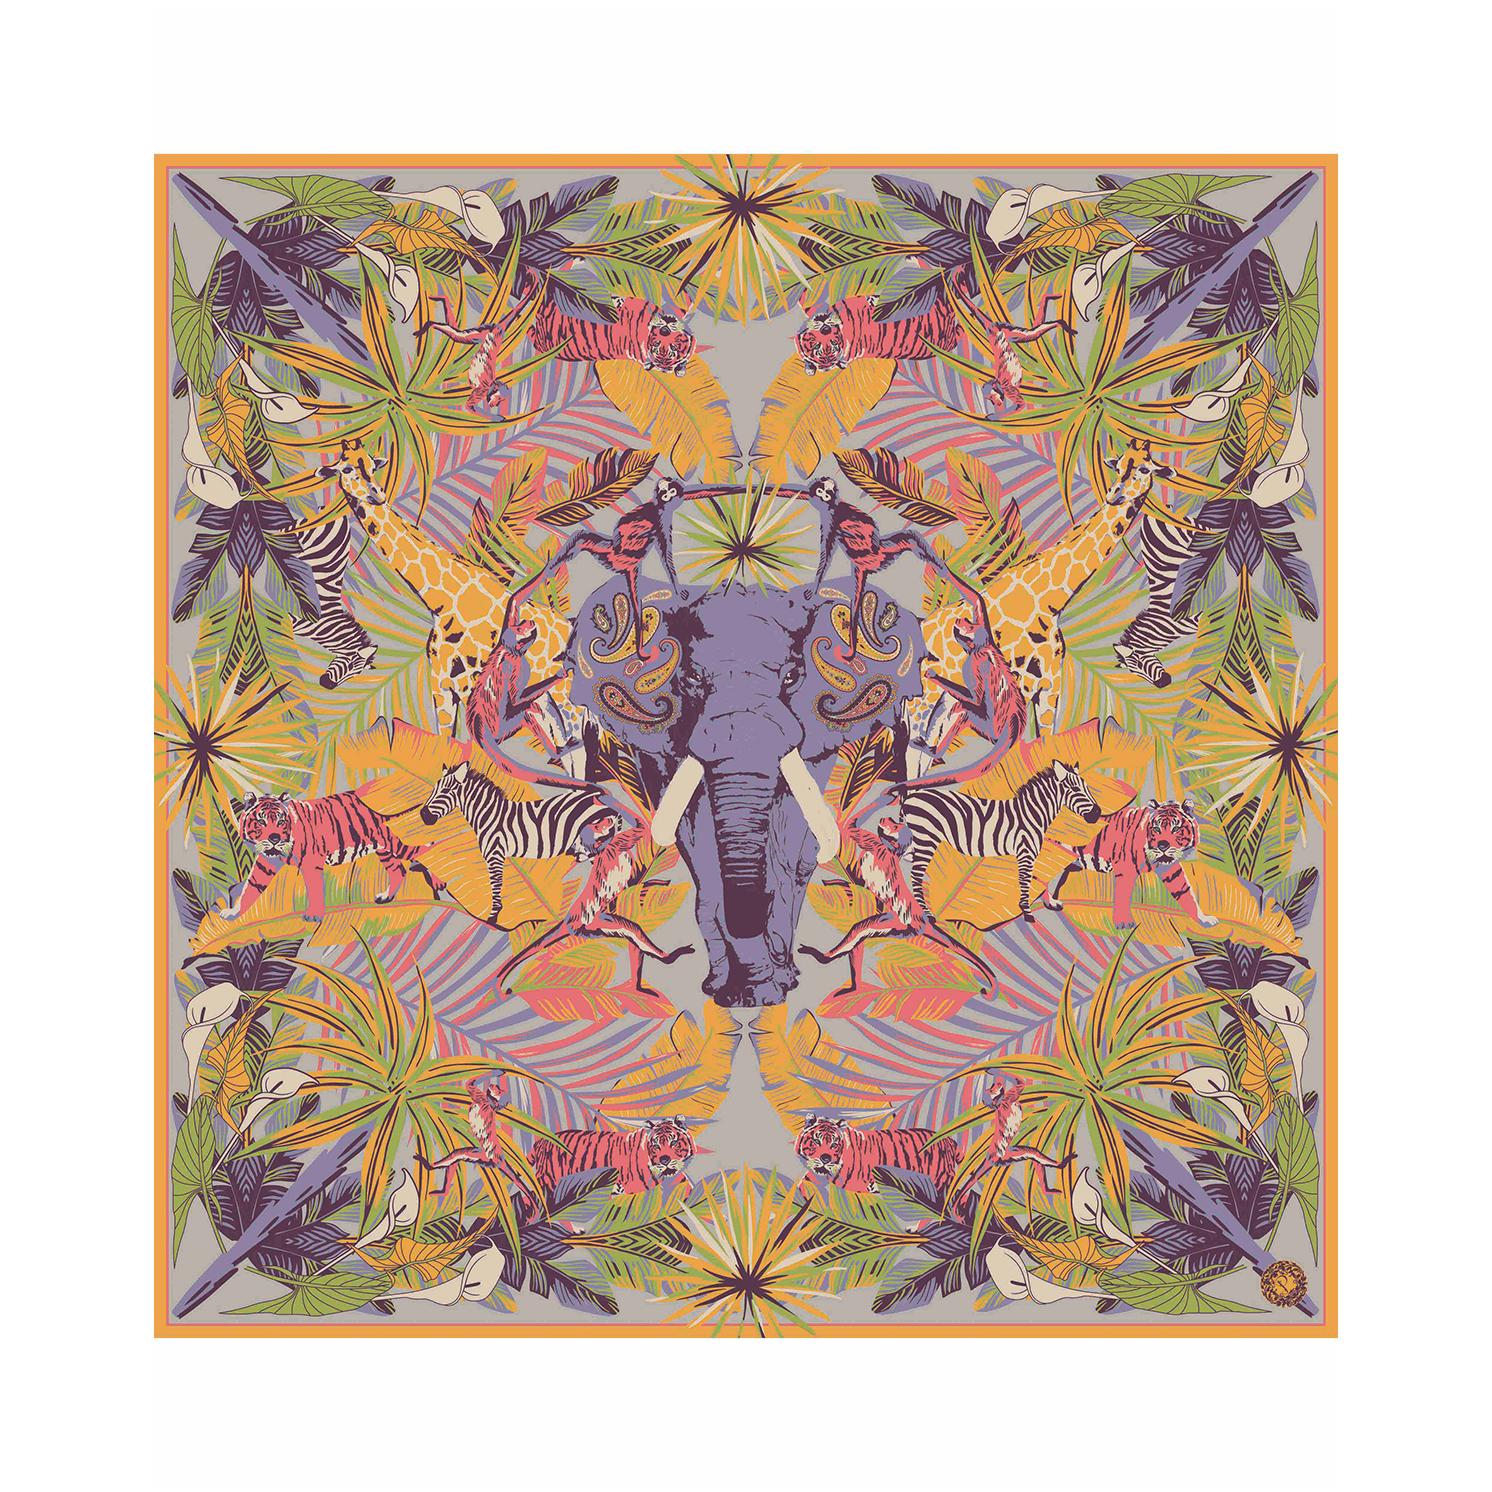 Powder – Elephant Parade Satin Square Scarf with Powder Presentation Gift Bag